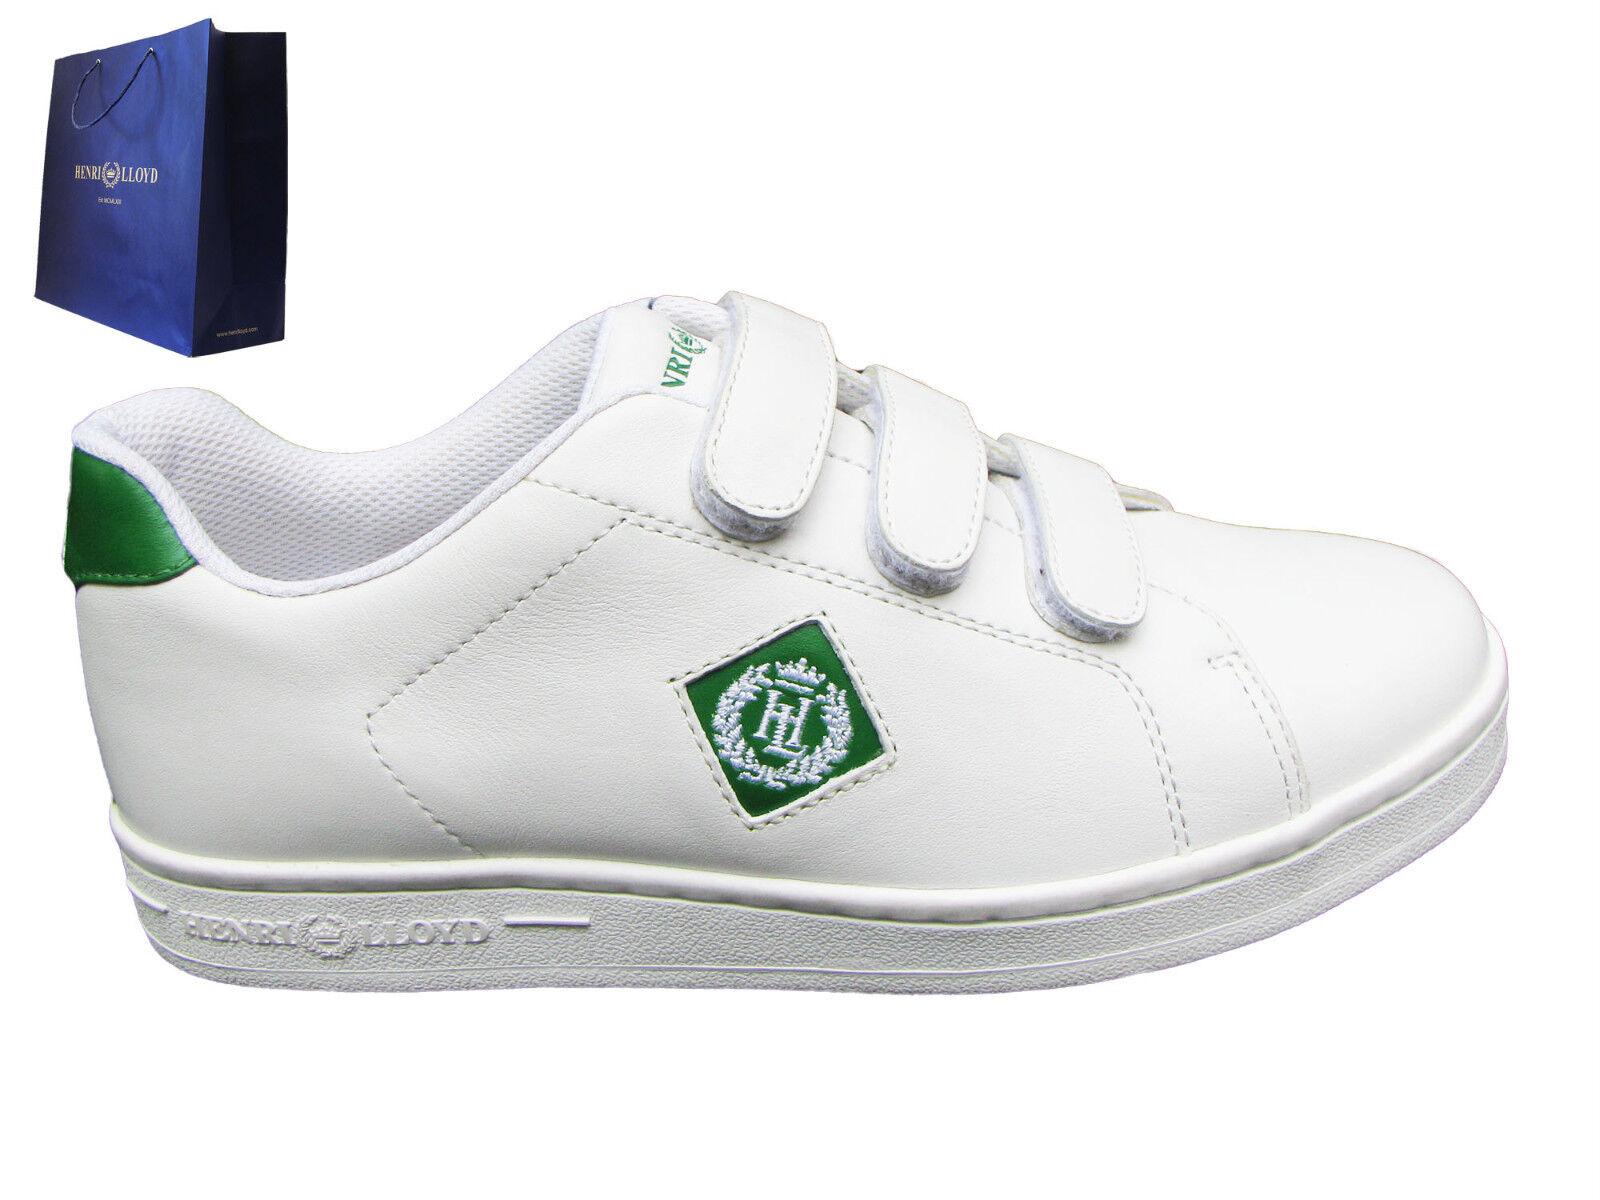 Neu Henri Lloyd Bild 3 Klettverschluss Herren Turnschuhe Weiß & Grün UK 8 Eu 42